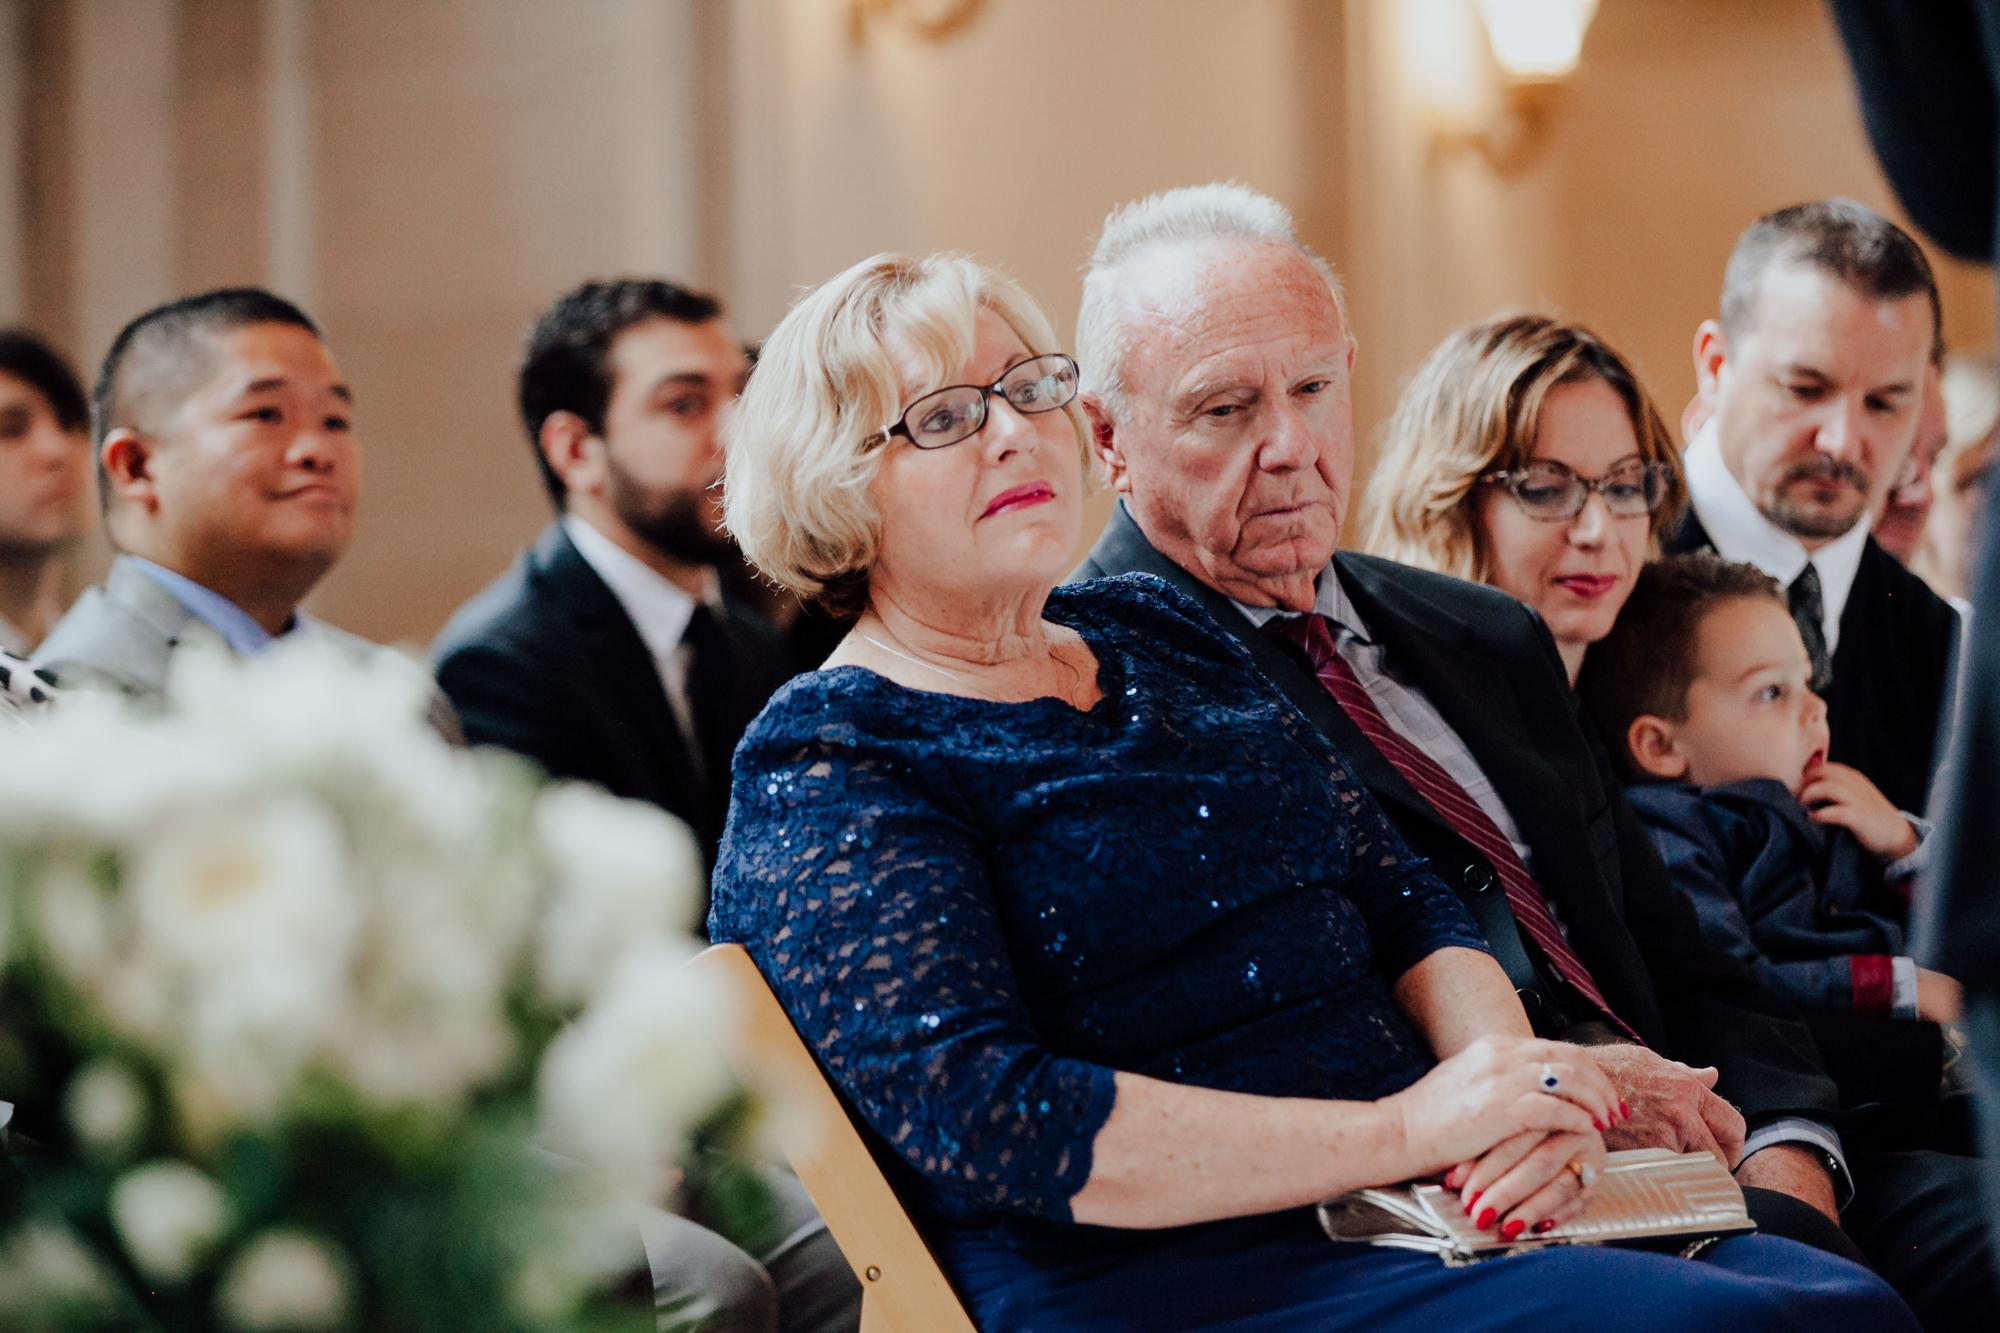 san-francisco-city-hall-wedding-marble-rye-photography-011715.JPG